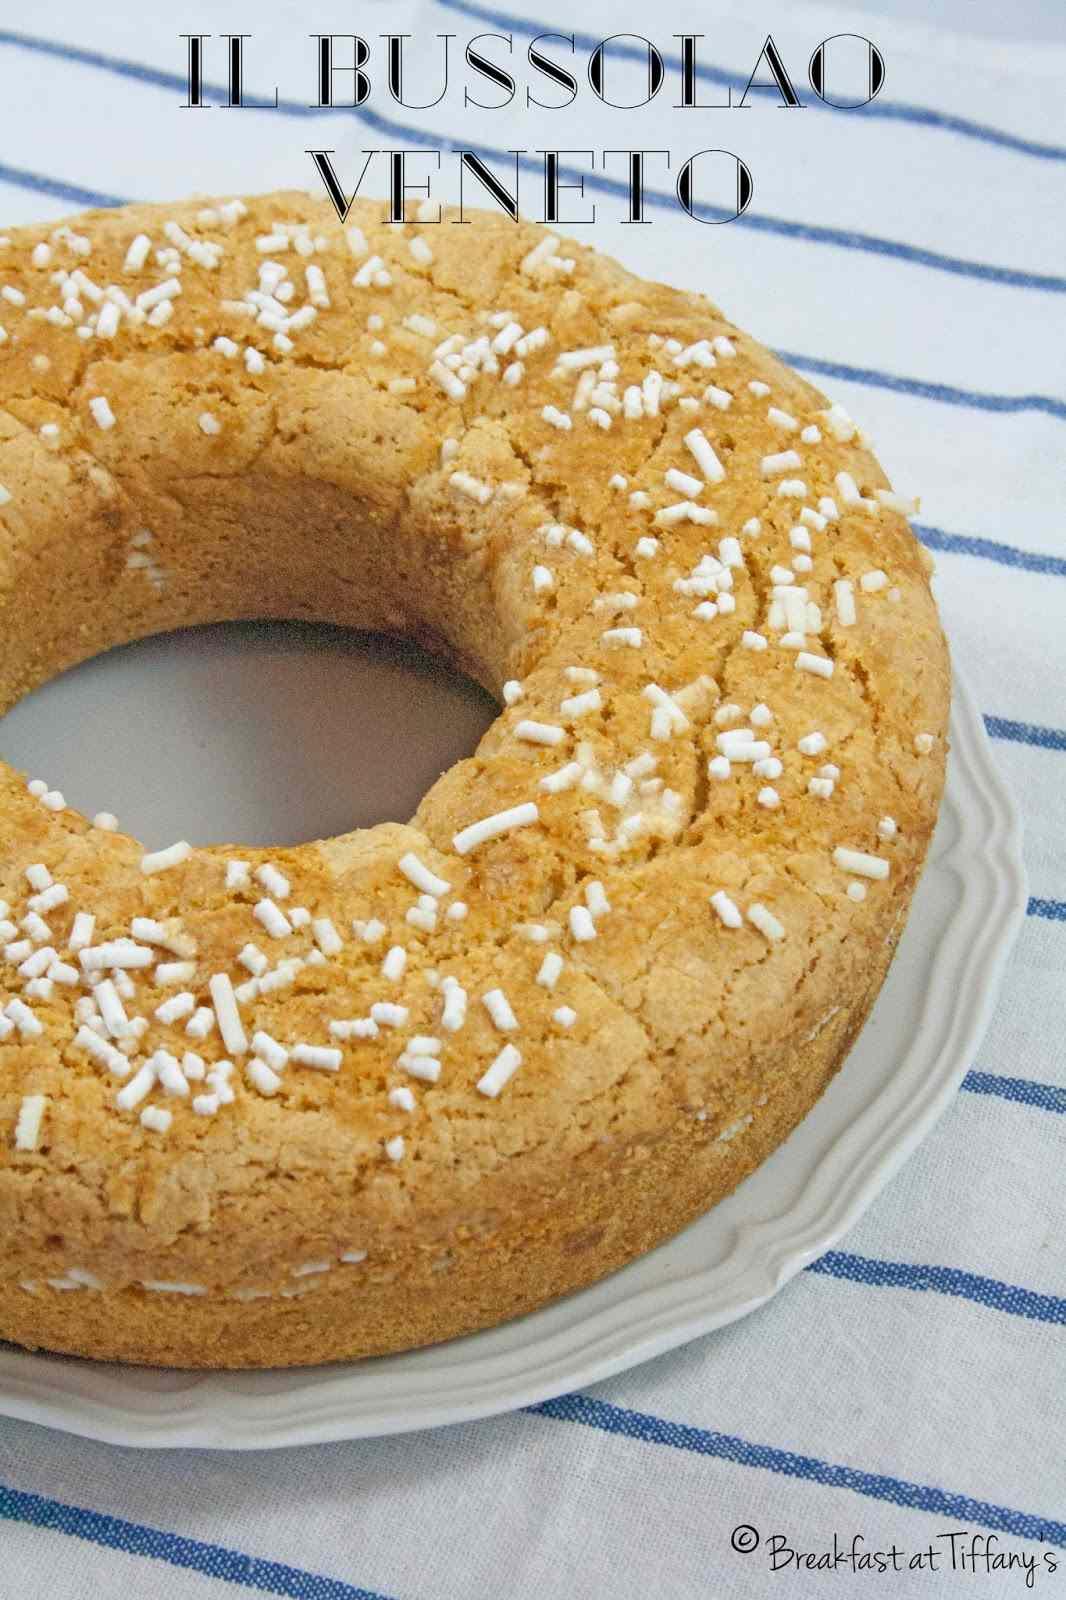 Ricetta: Il bussolao veneto o brasadelo / bussolao: typical cake from north of italy